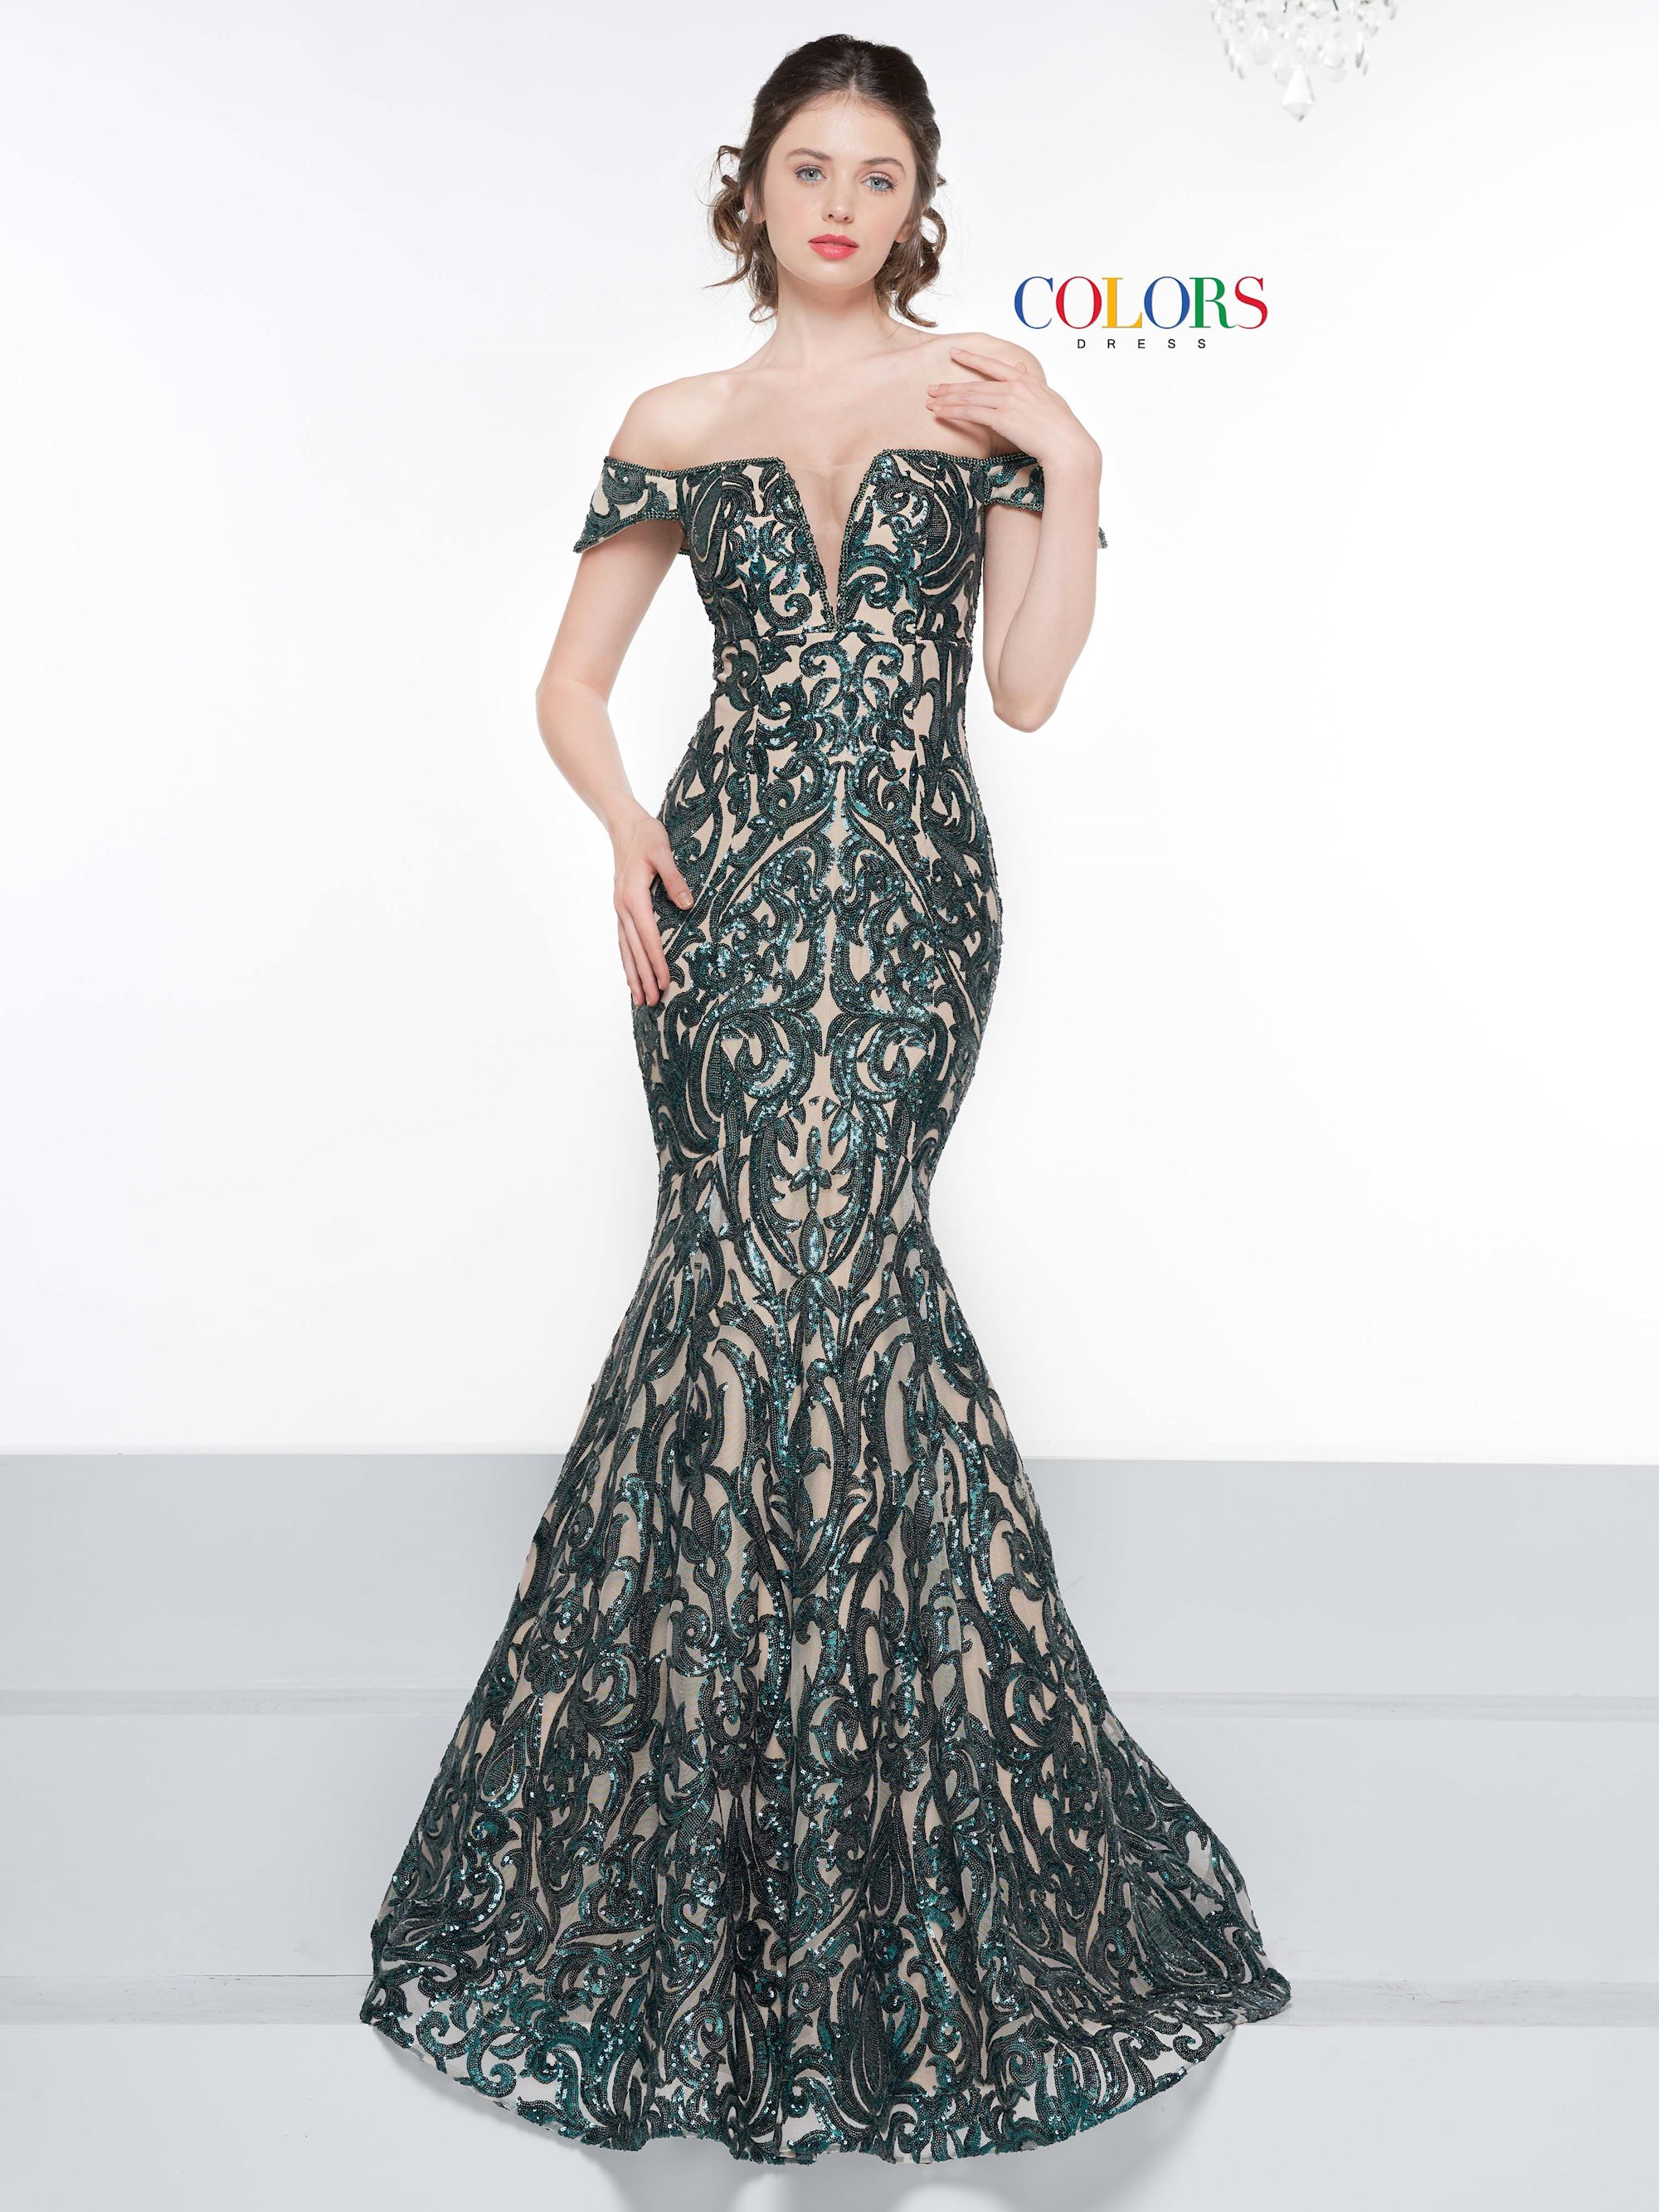 3a17f0b67ec02 Colors Dress - 2037 | After Five Fashion